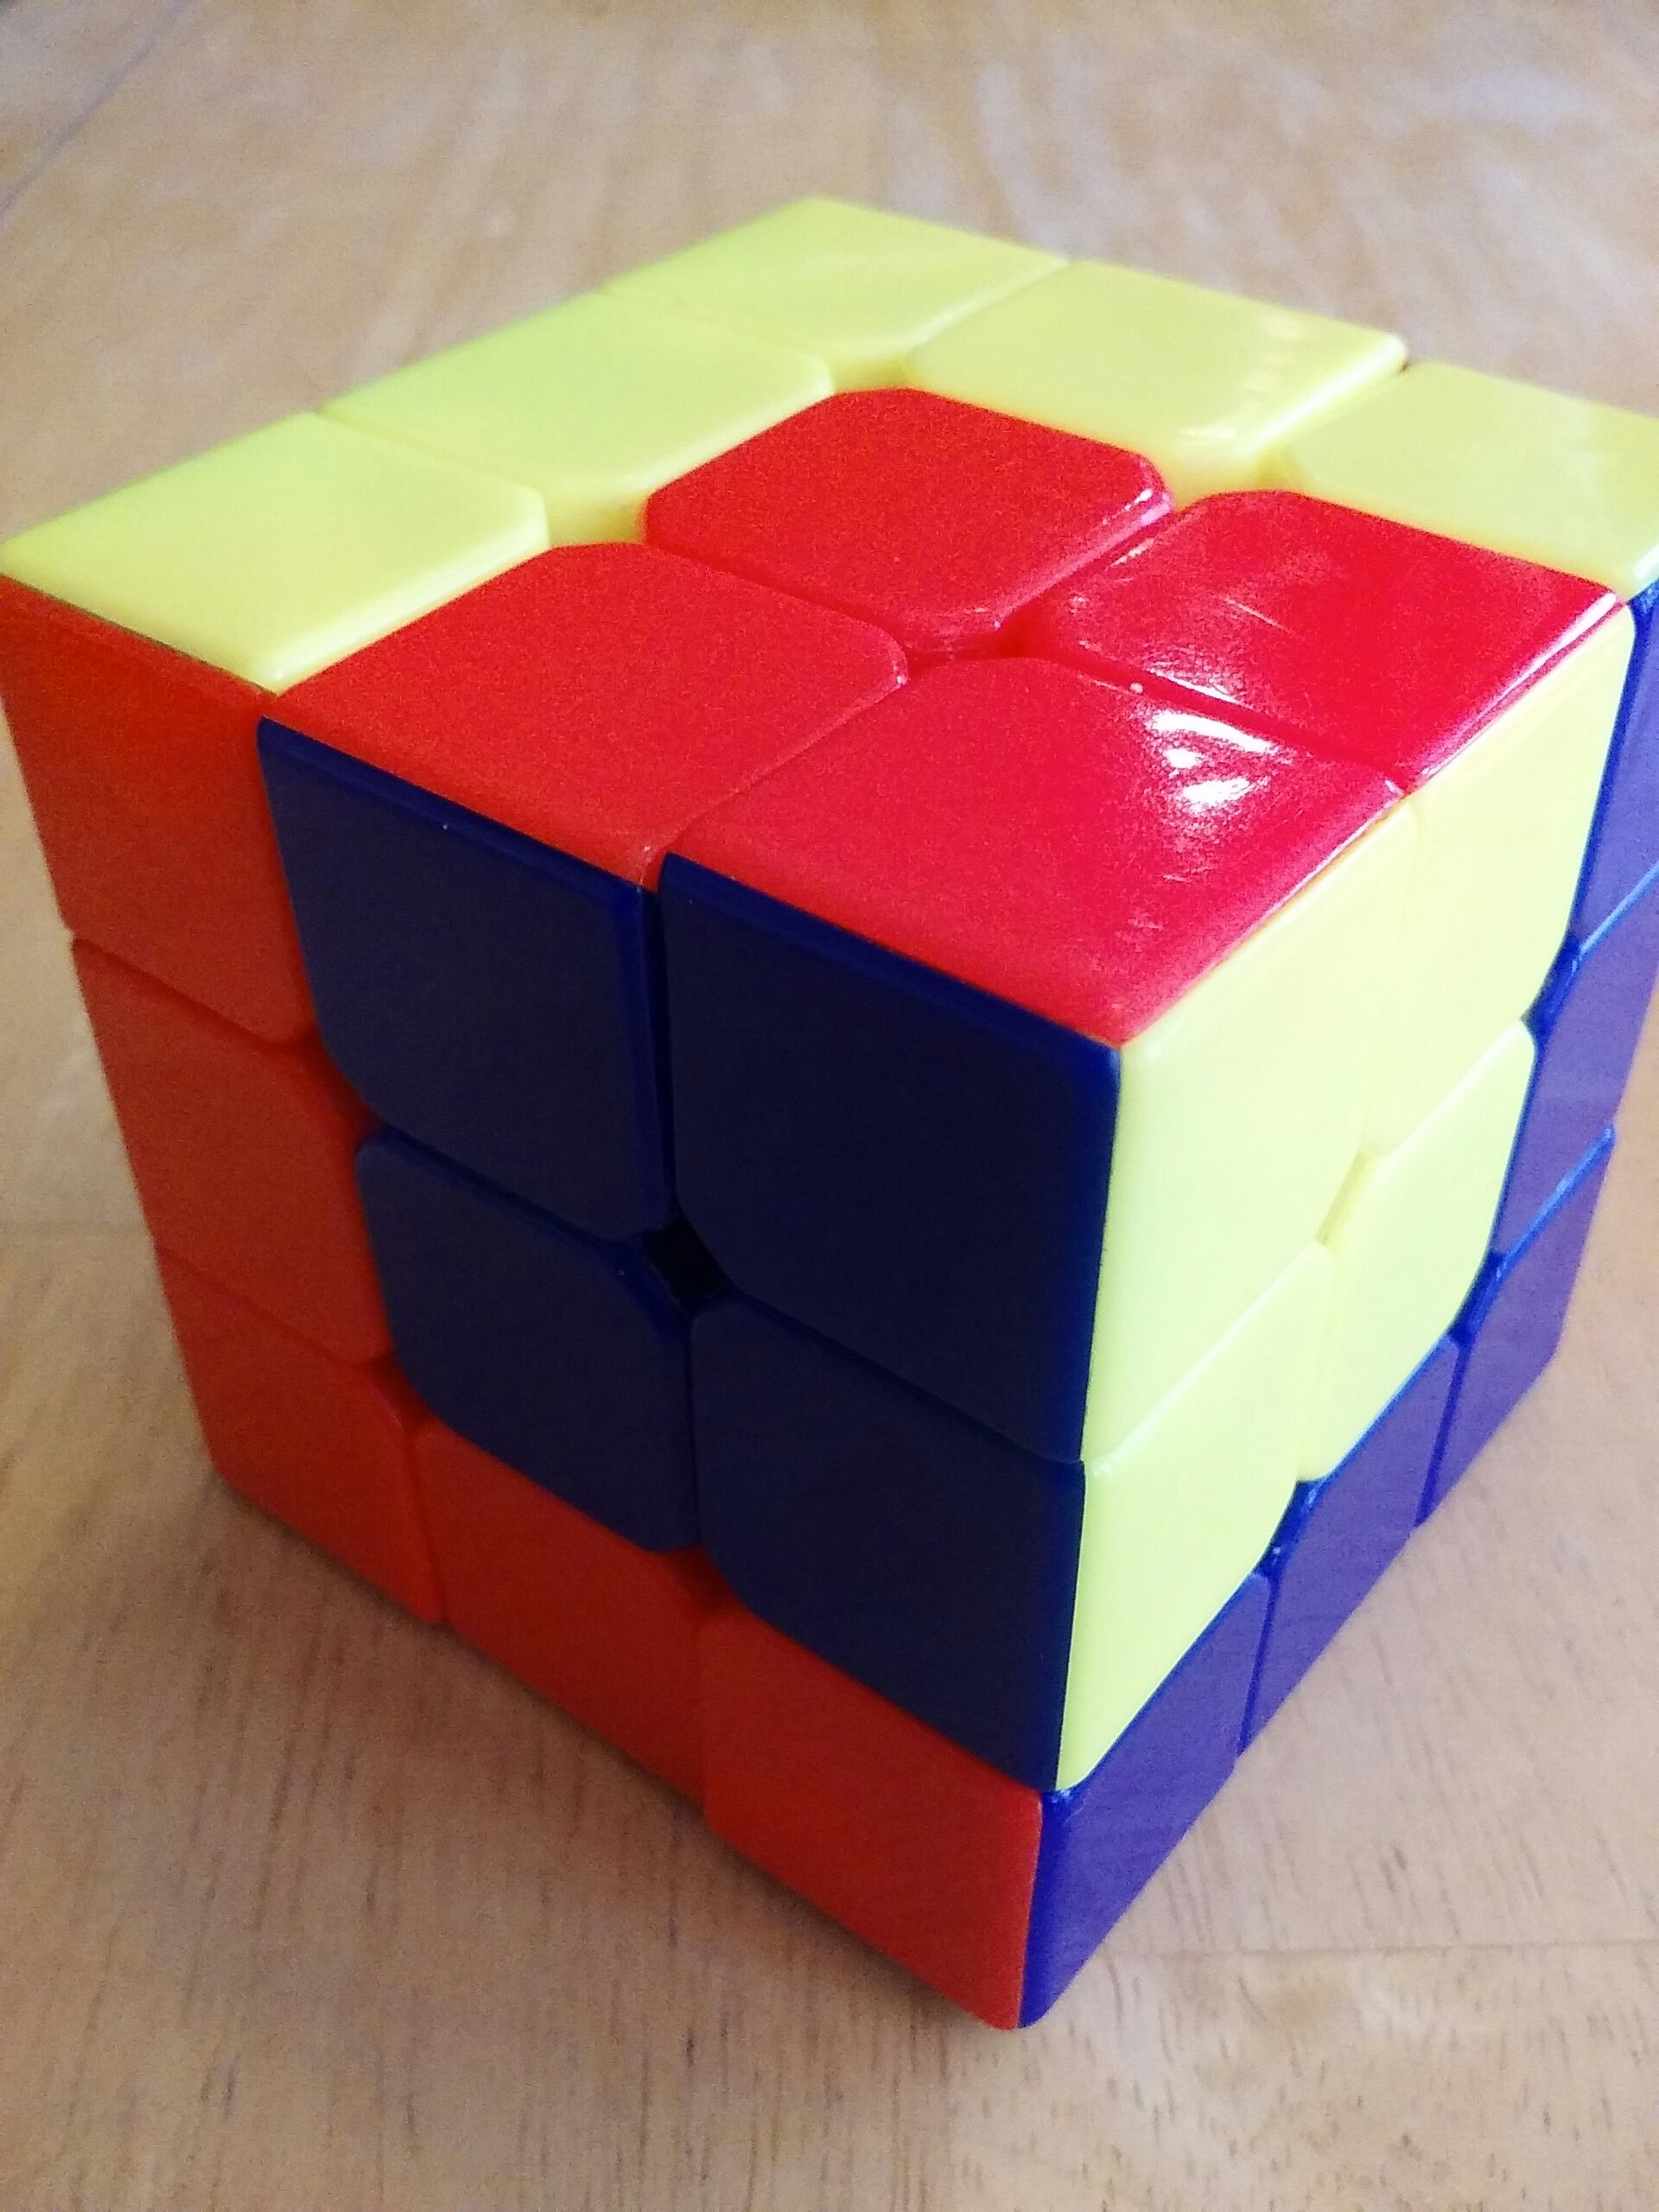 Rubiks Cube Tricks: Cube in a Cube